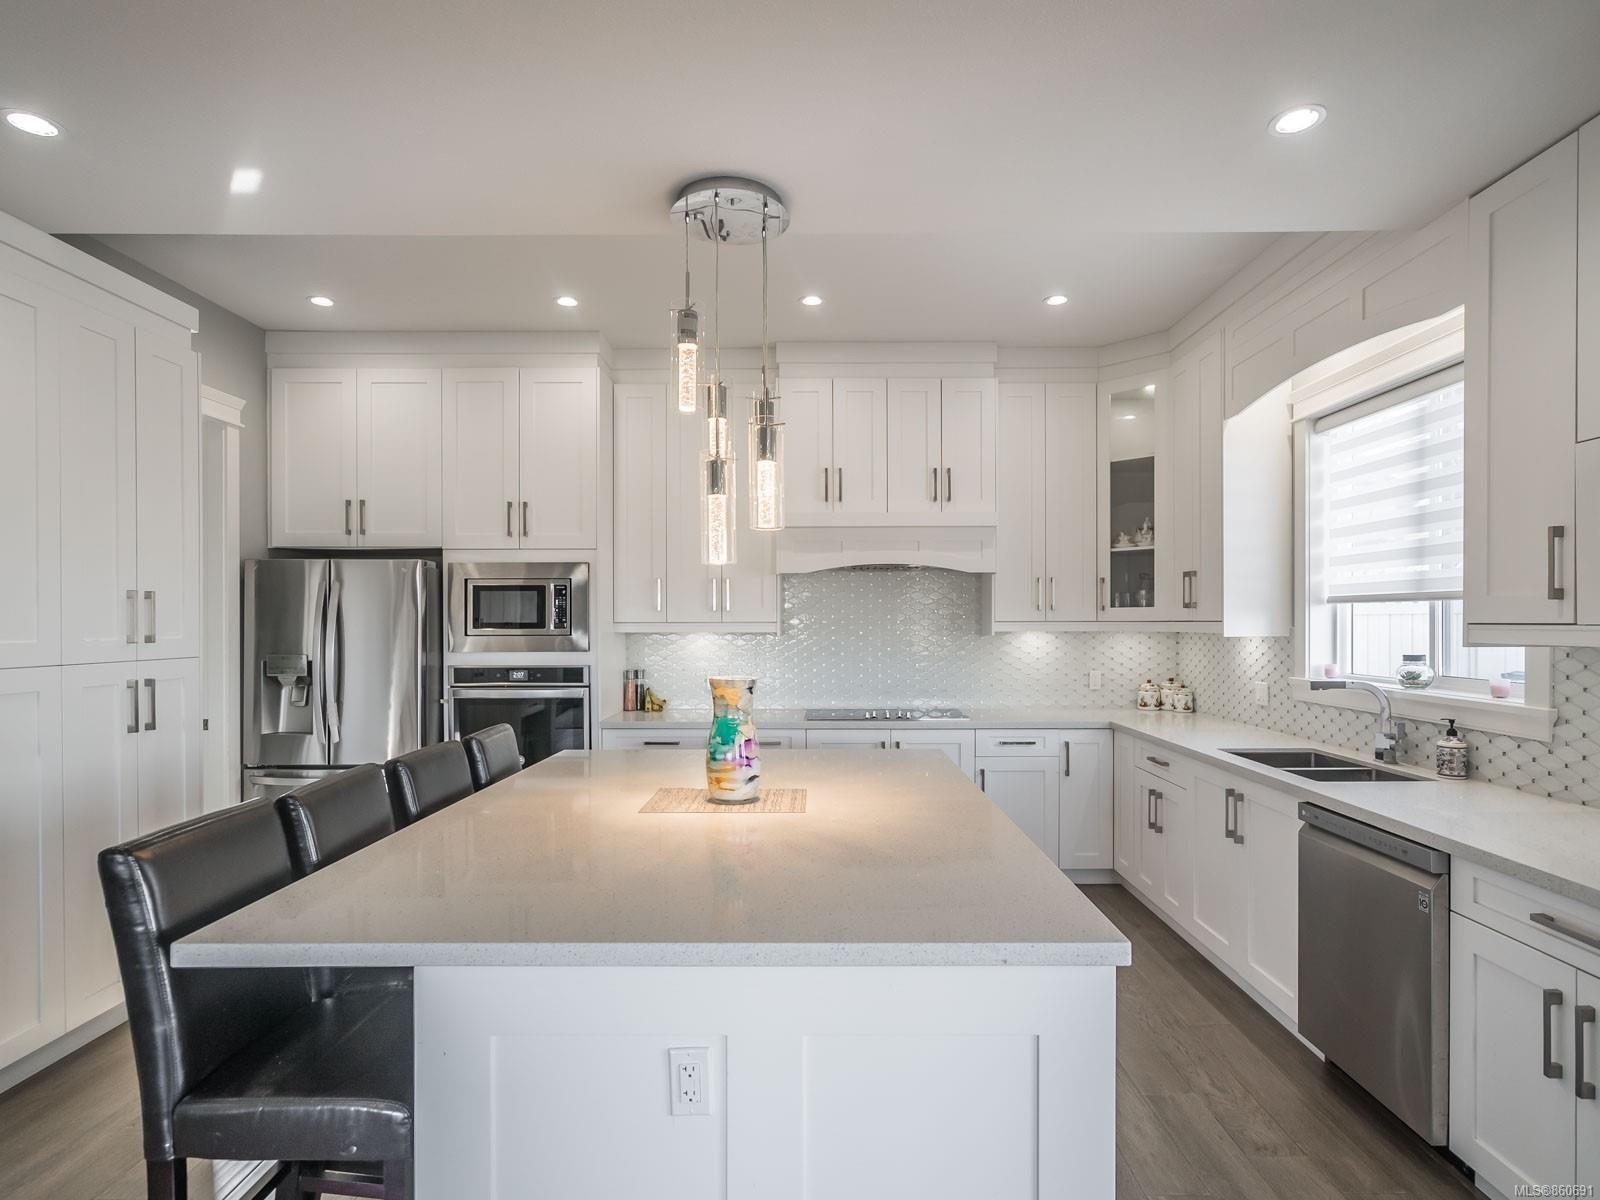 Photo 10: Photos: 5821 Linley Valley Dr in : Na North Nanaimo House for sale (Nanaimo)  : MLS®# 860691